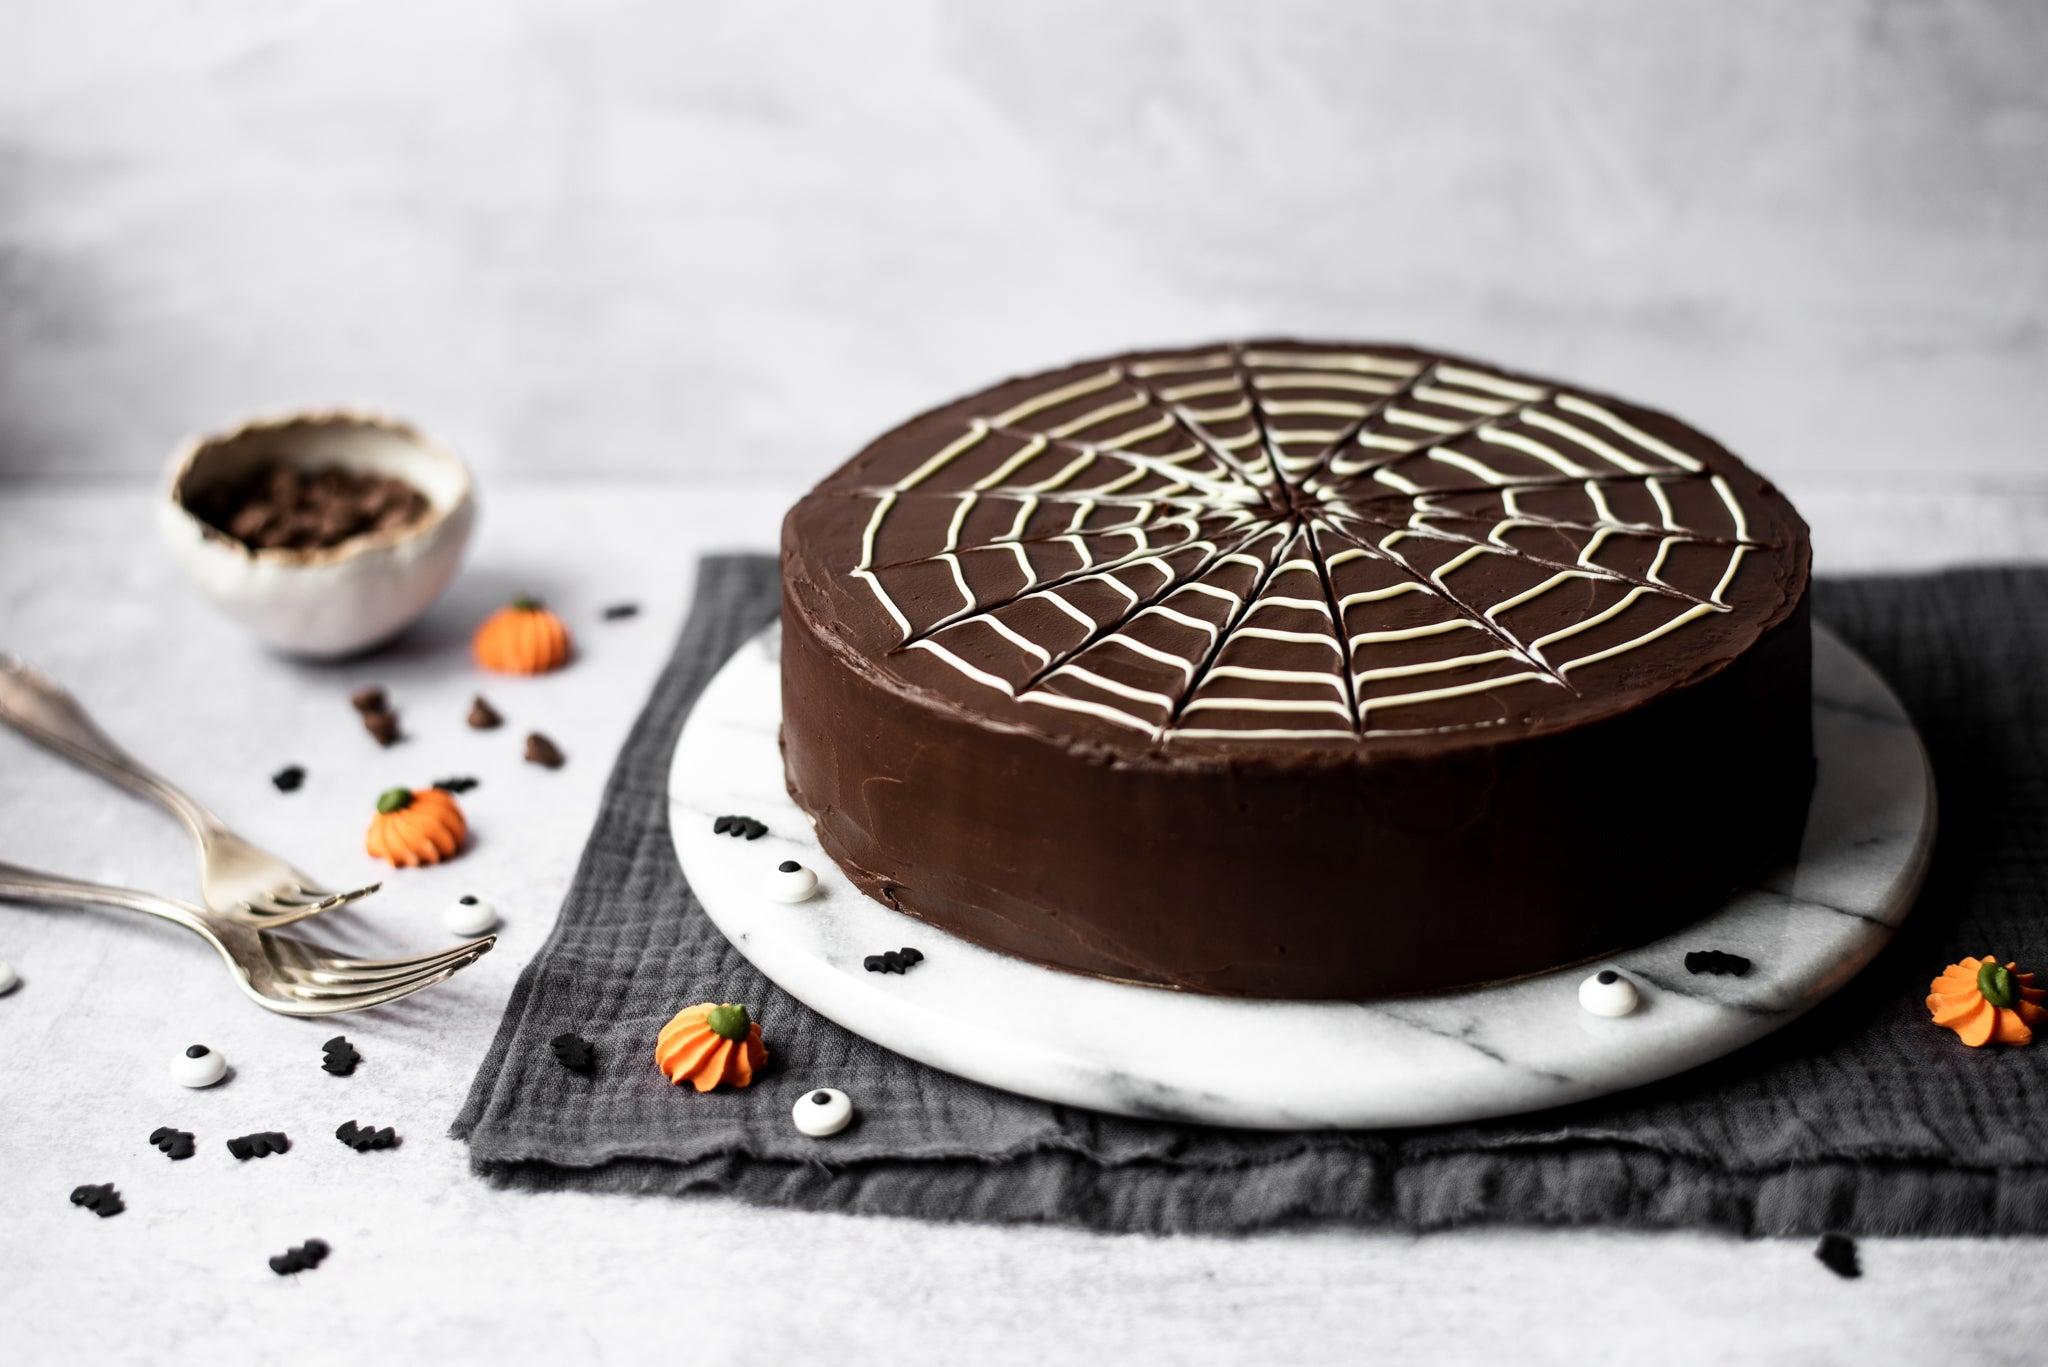 Spider-Web-Cake-WEB-RES-2.jpg